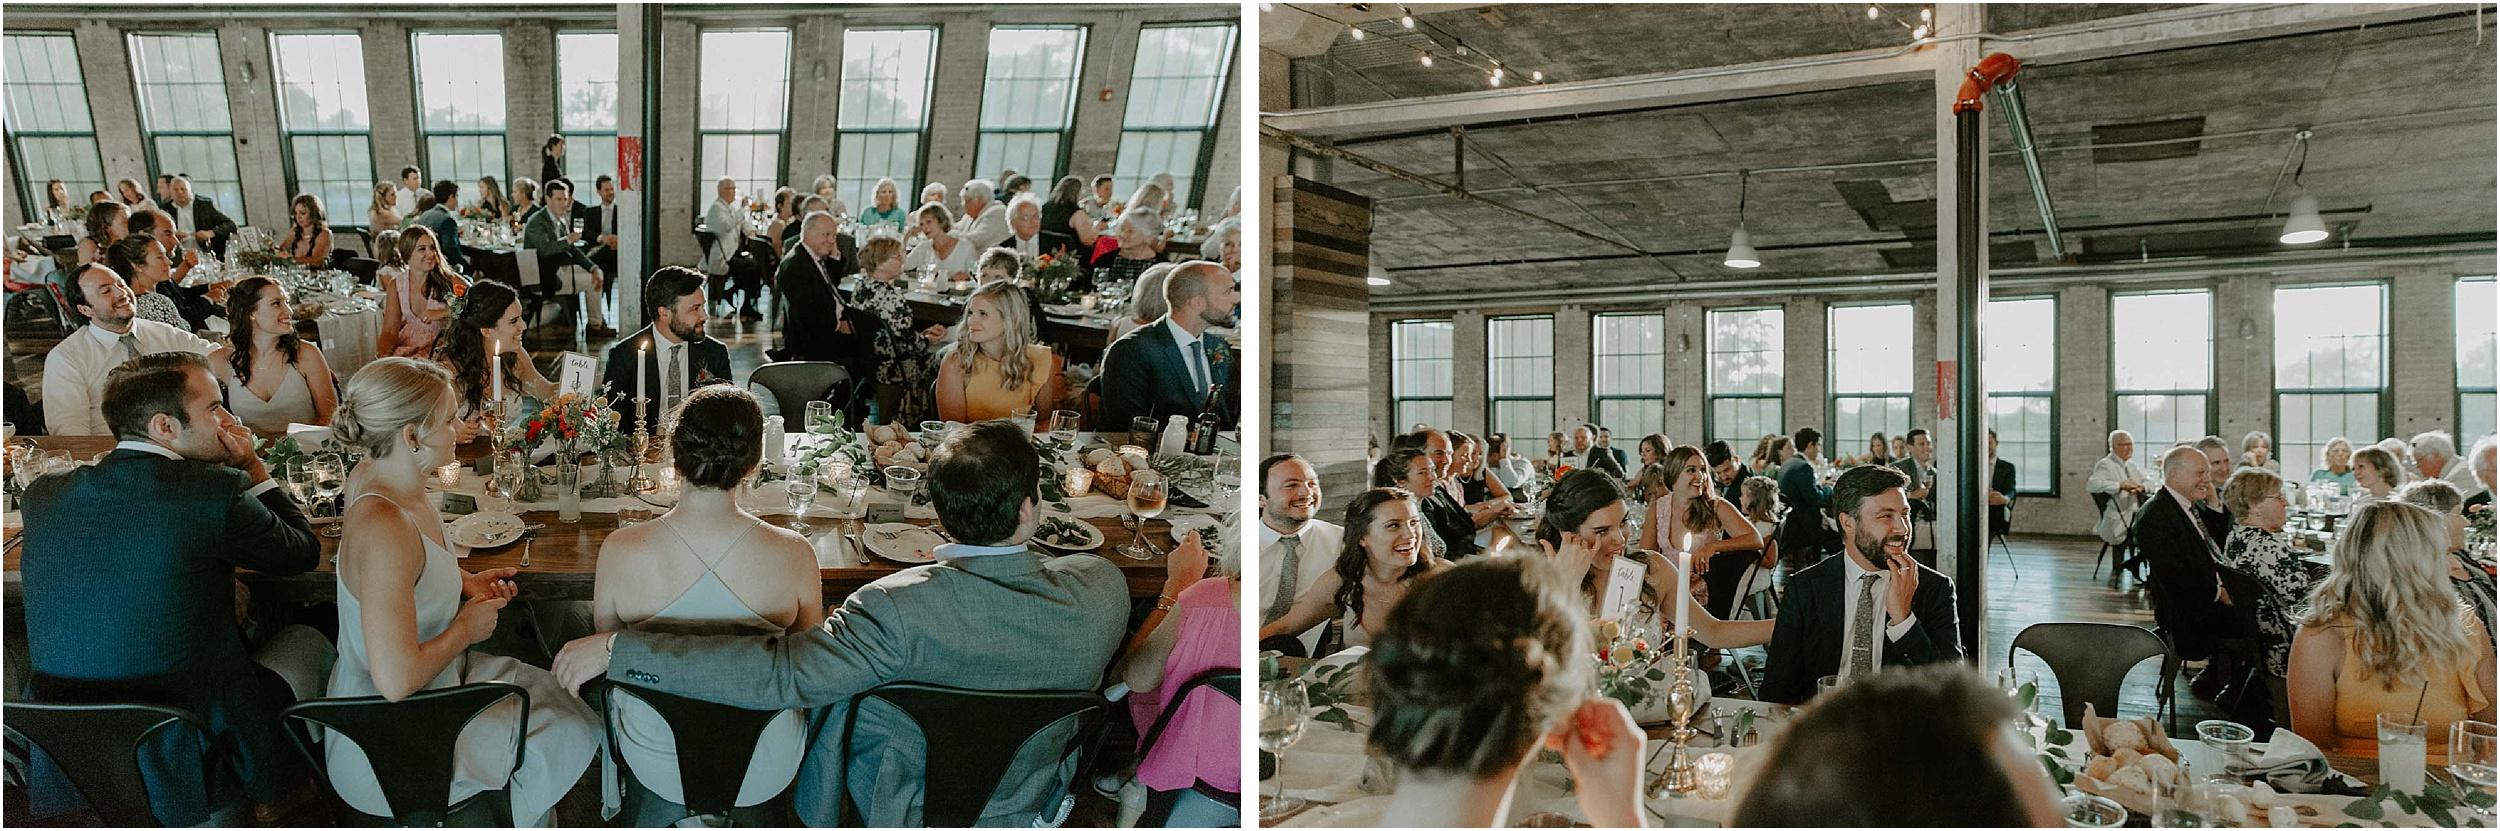 journeyman_distillery_wedding_photographer_chicago_il_wright_photographs-7001.jpg